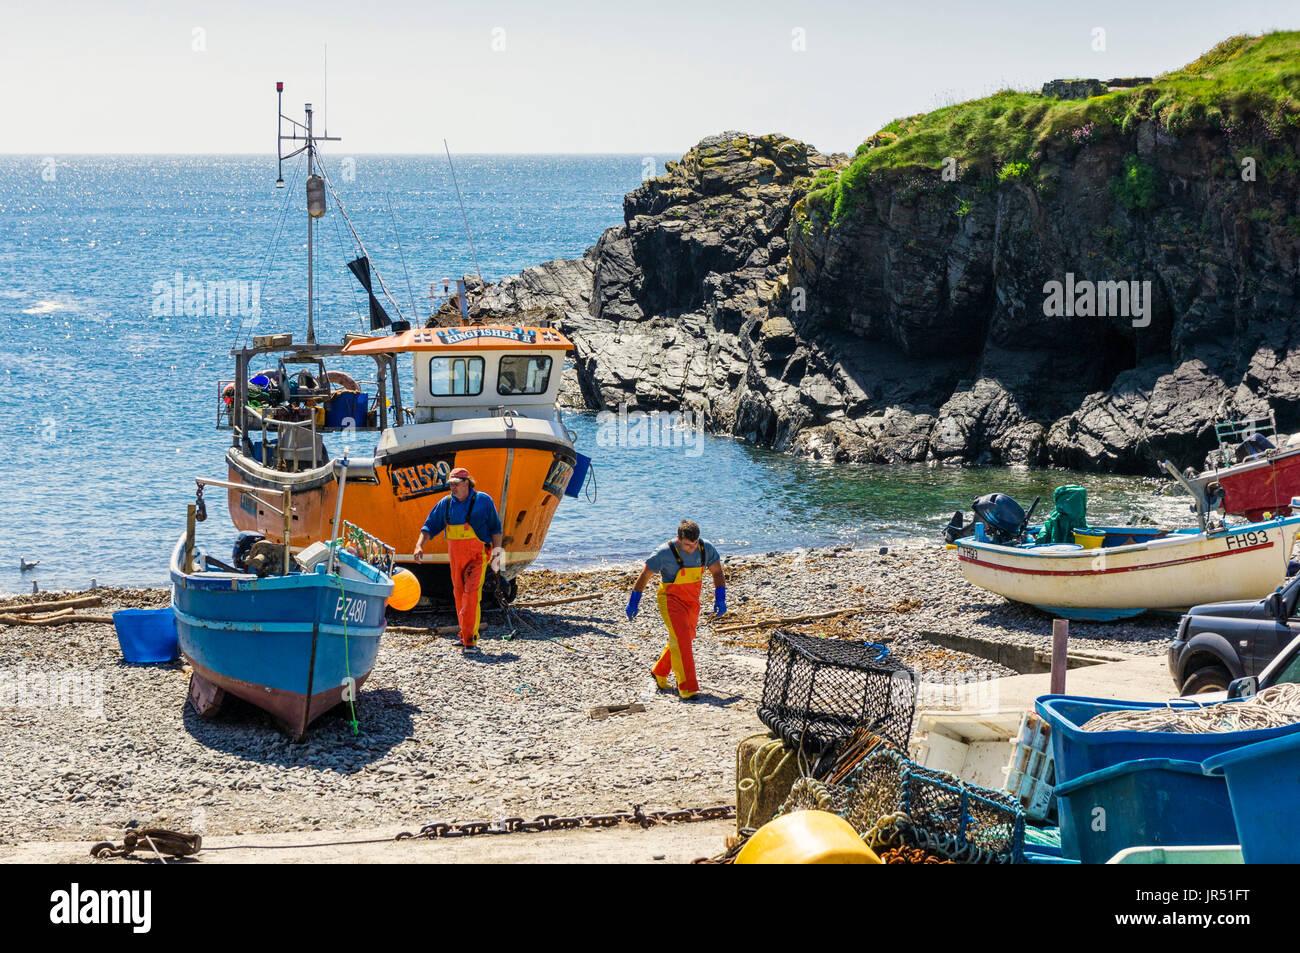 Fishing boat and fisherman at Cadgwith Cove, Lizard Peninsula, Cornwall, UK - Stock Image